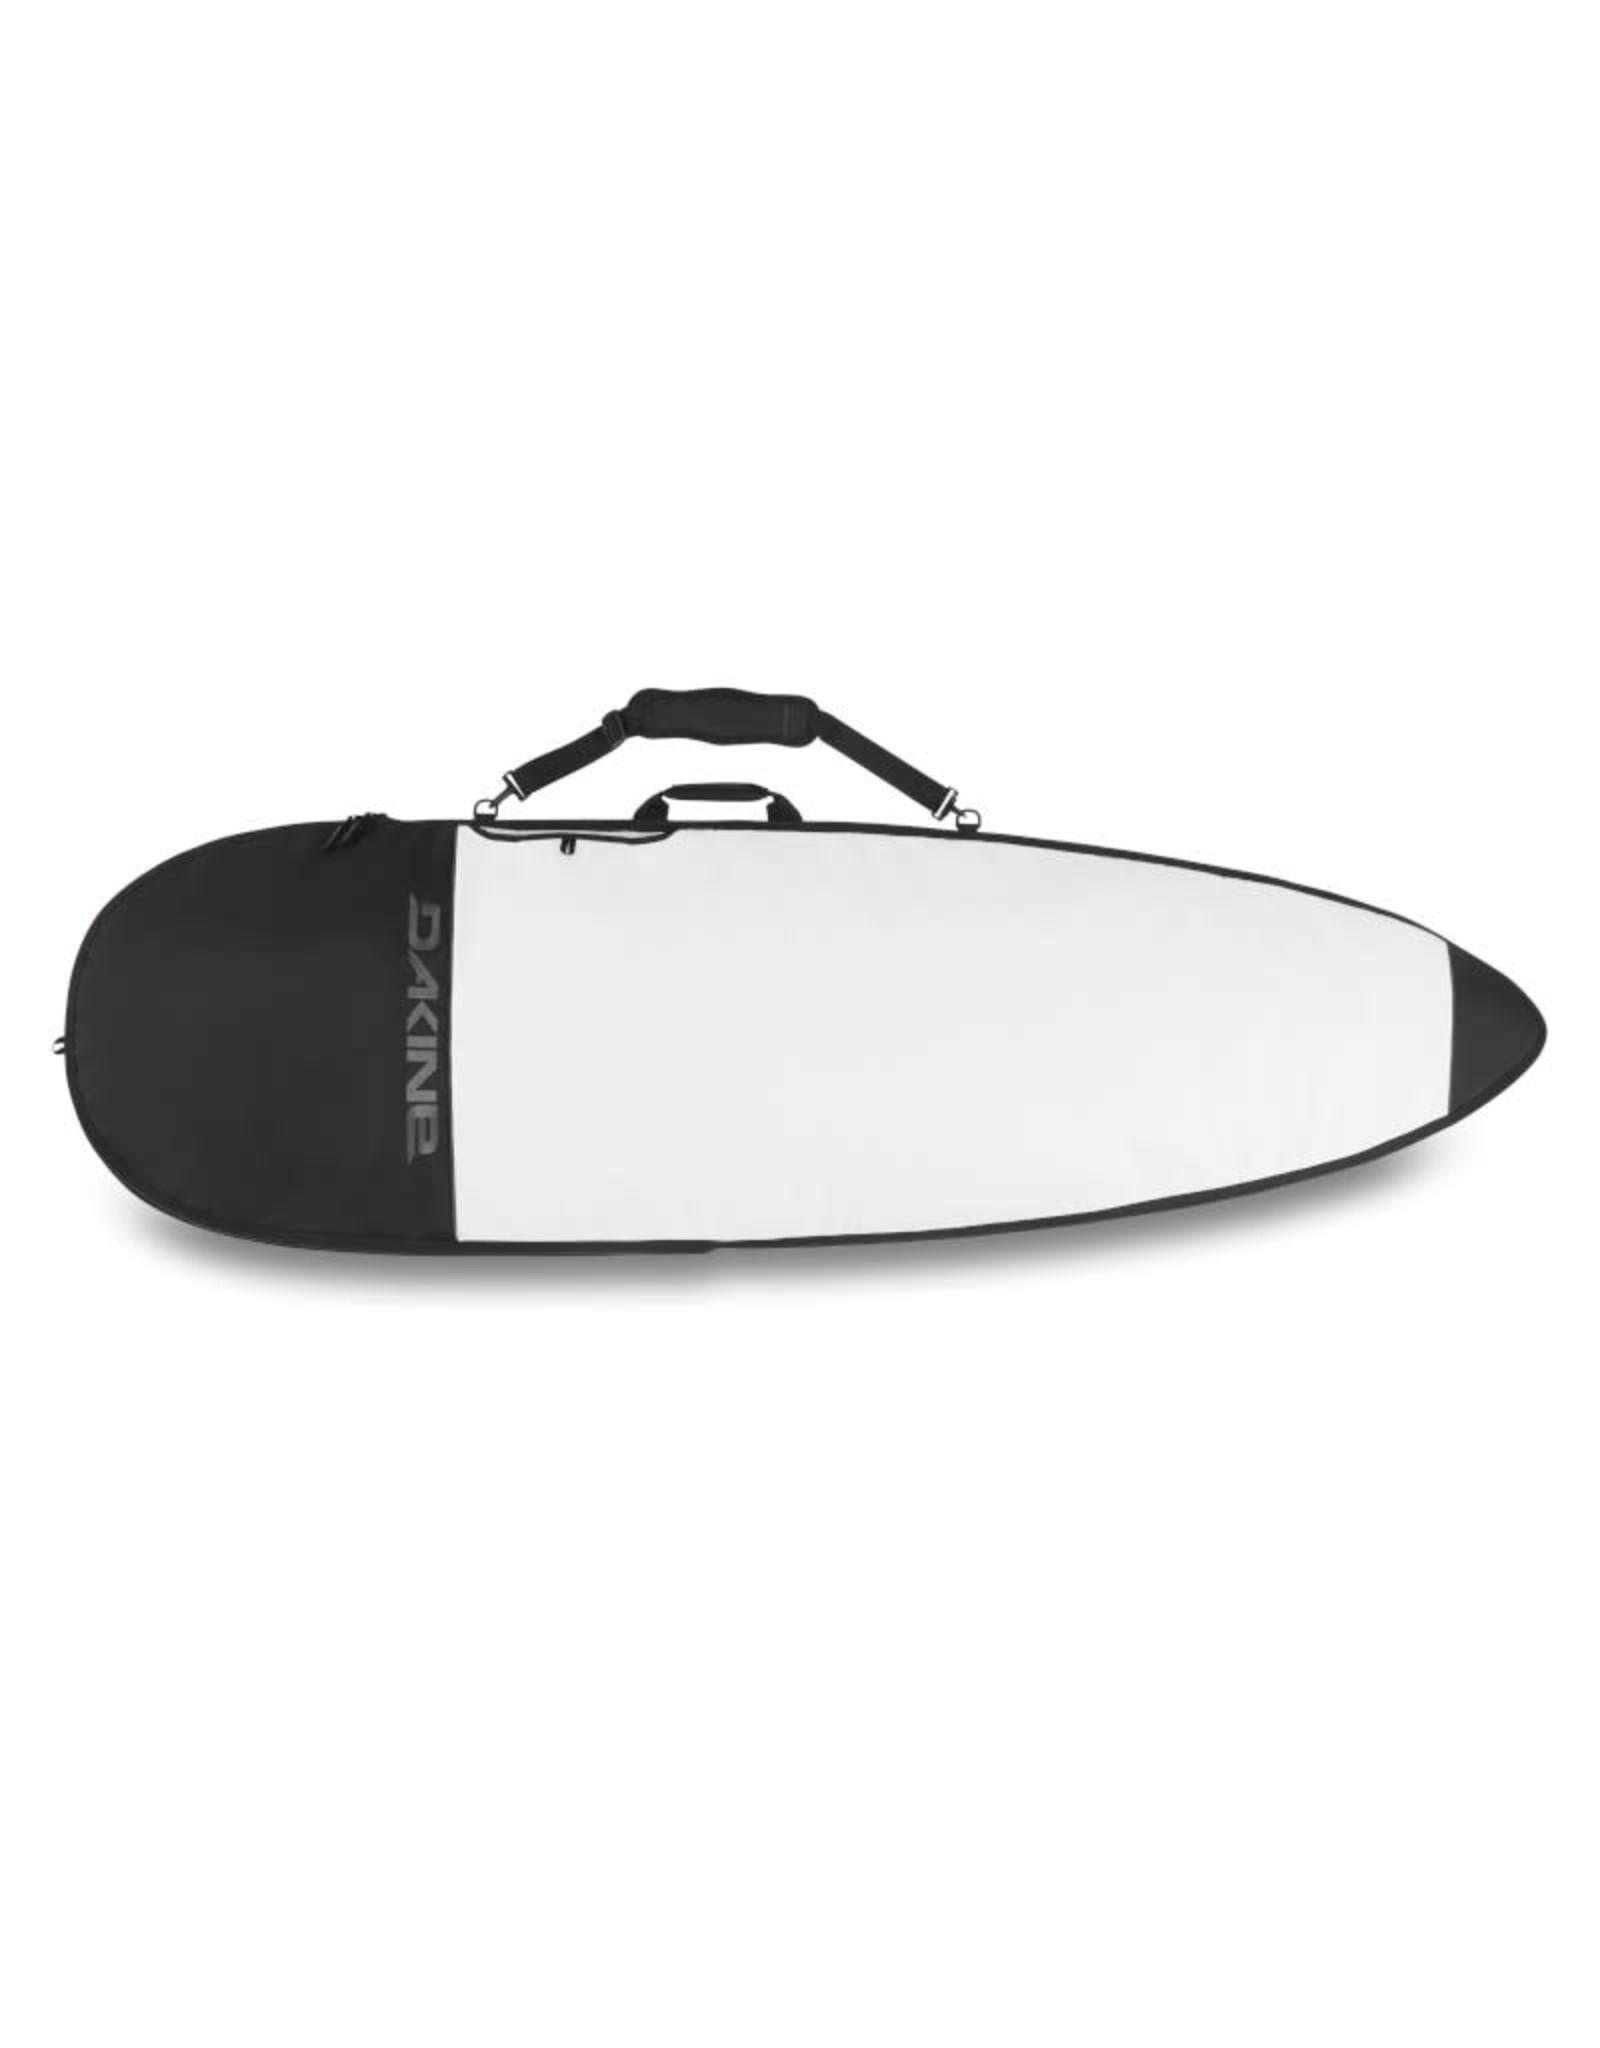 "Dakine Dakine 5'8"" Daylight Truster Surfboard Bag White"